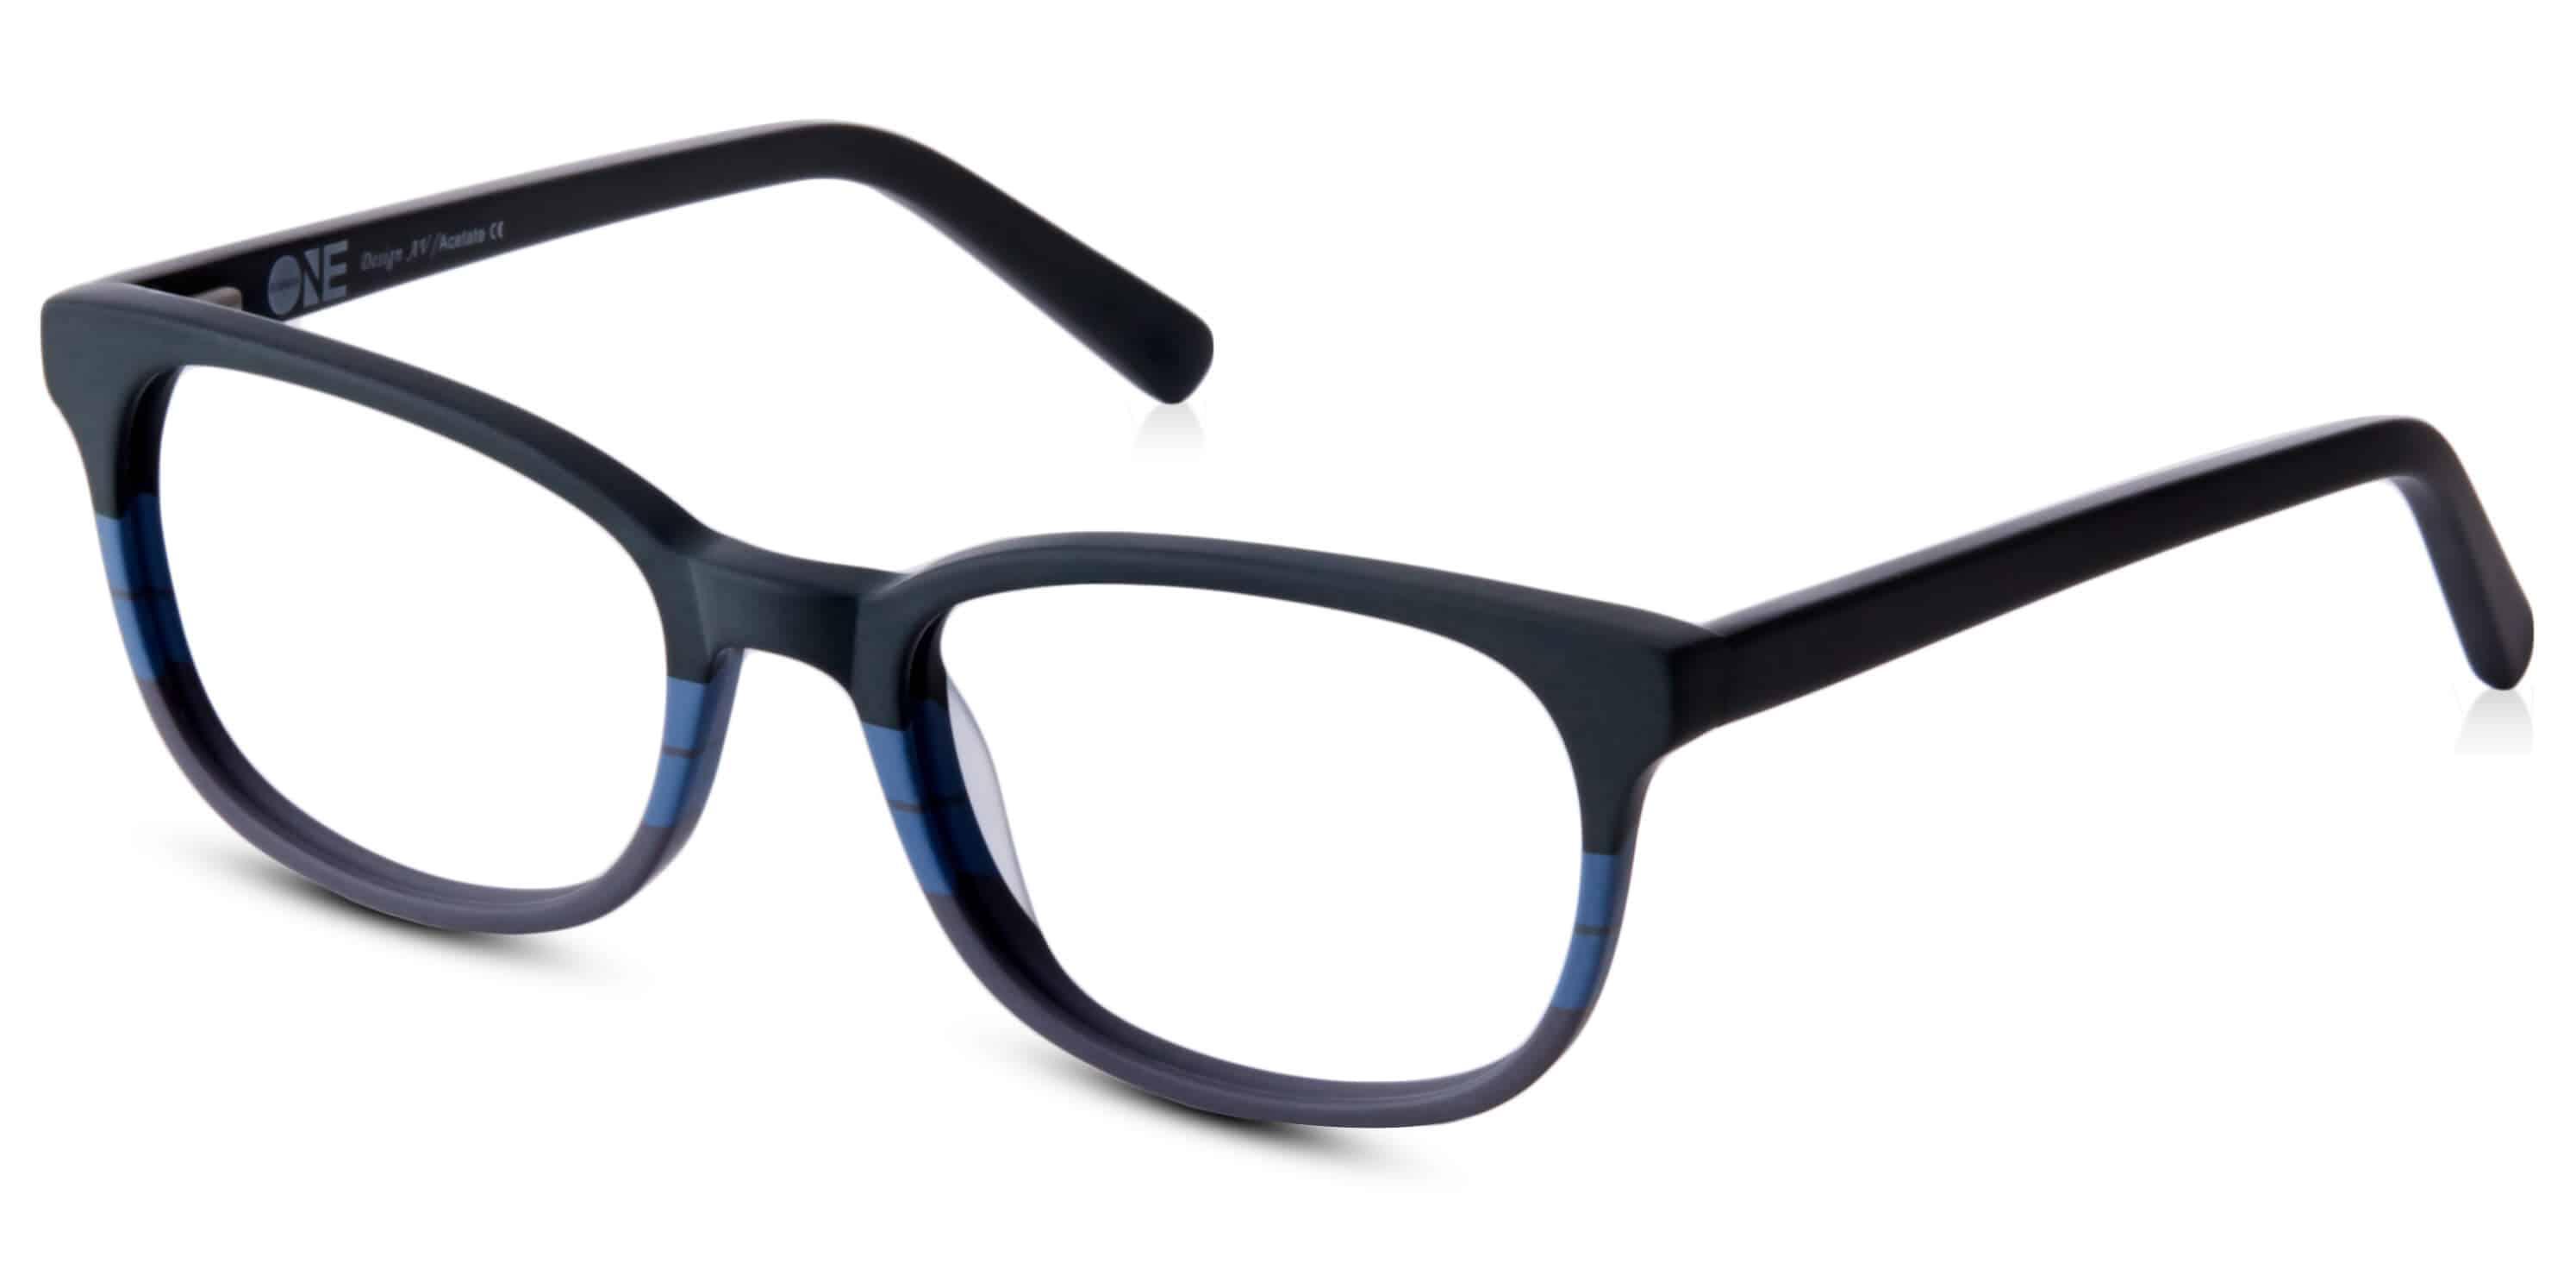 ONE- פלסטיק שחור כחול ואפור מתחלף